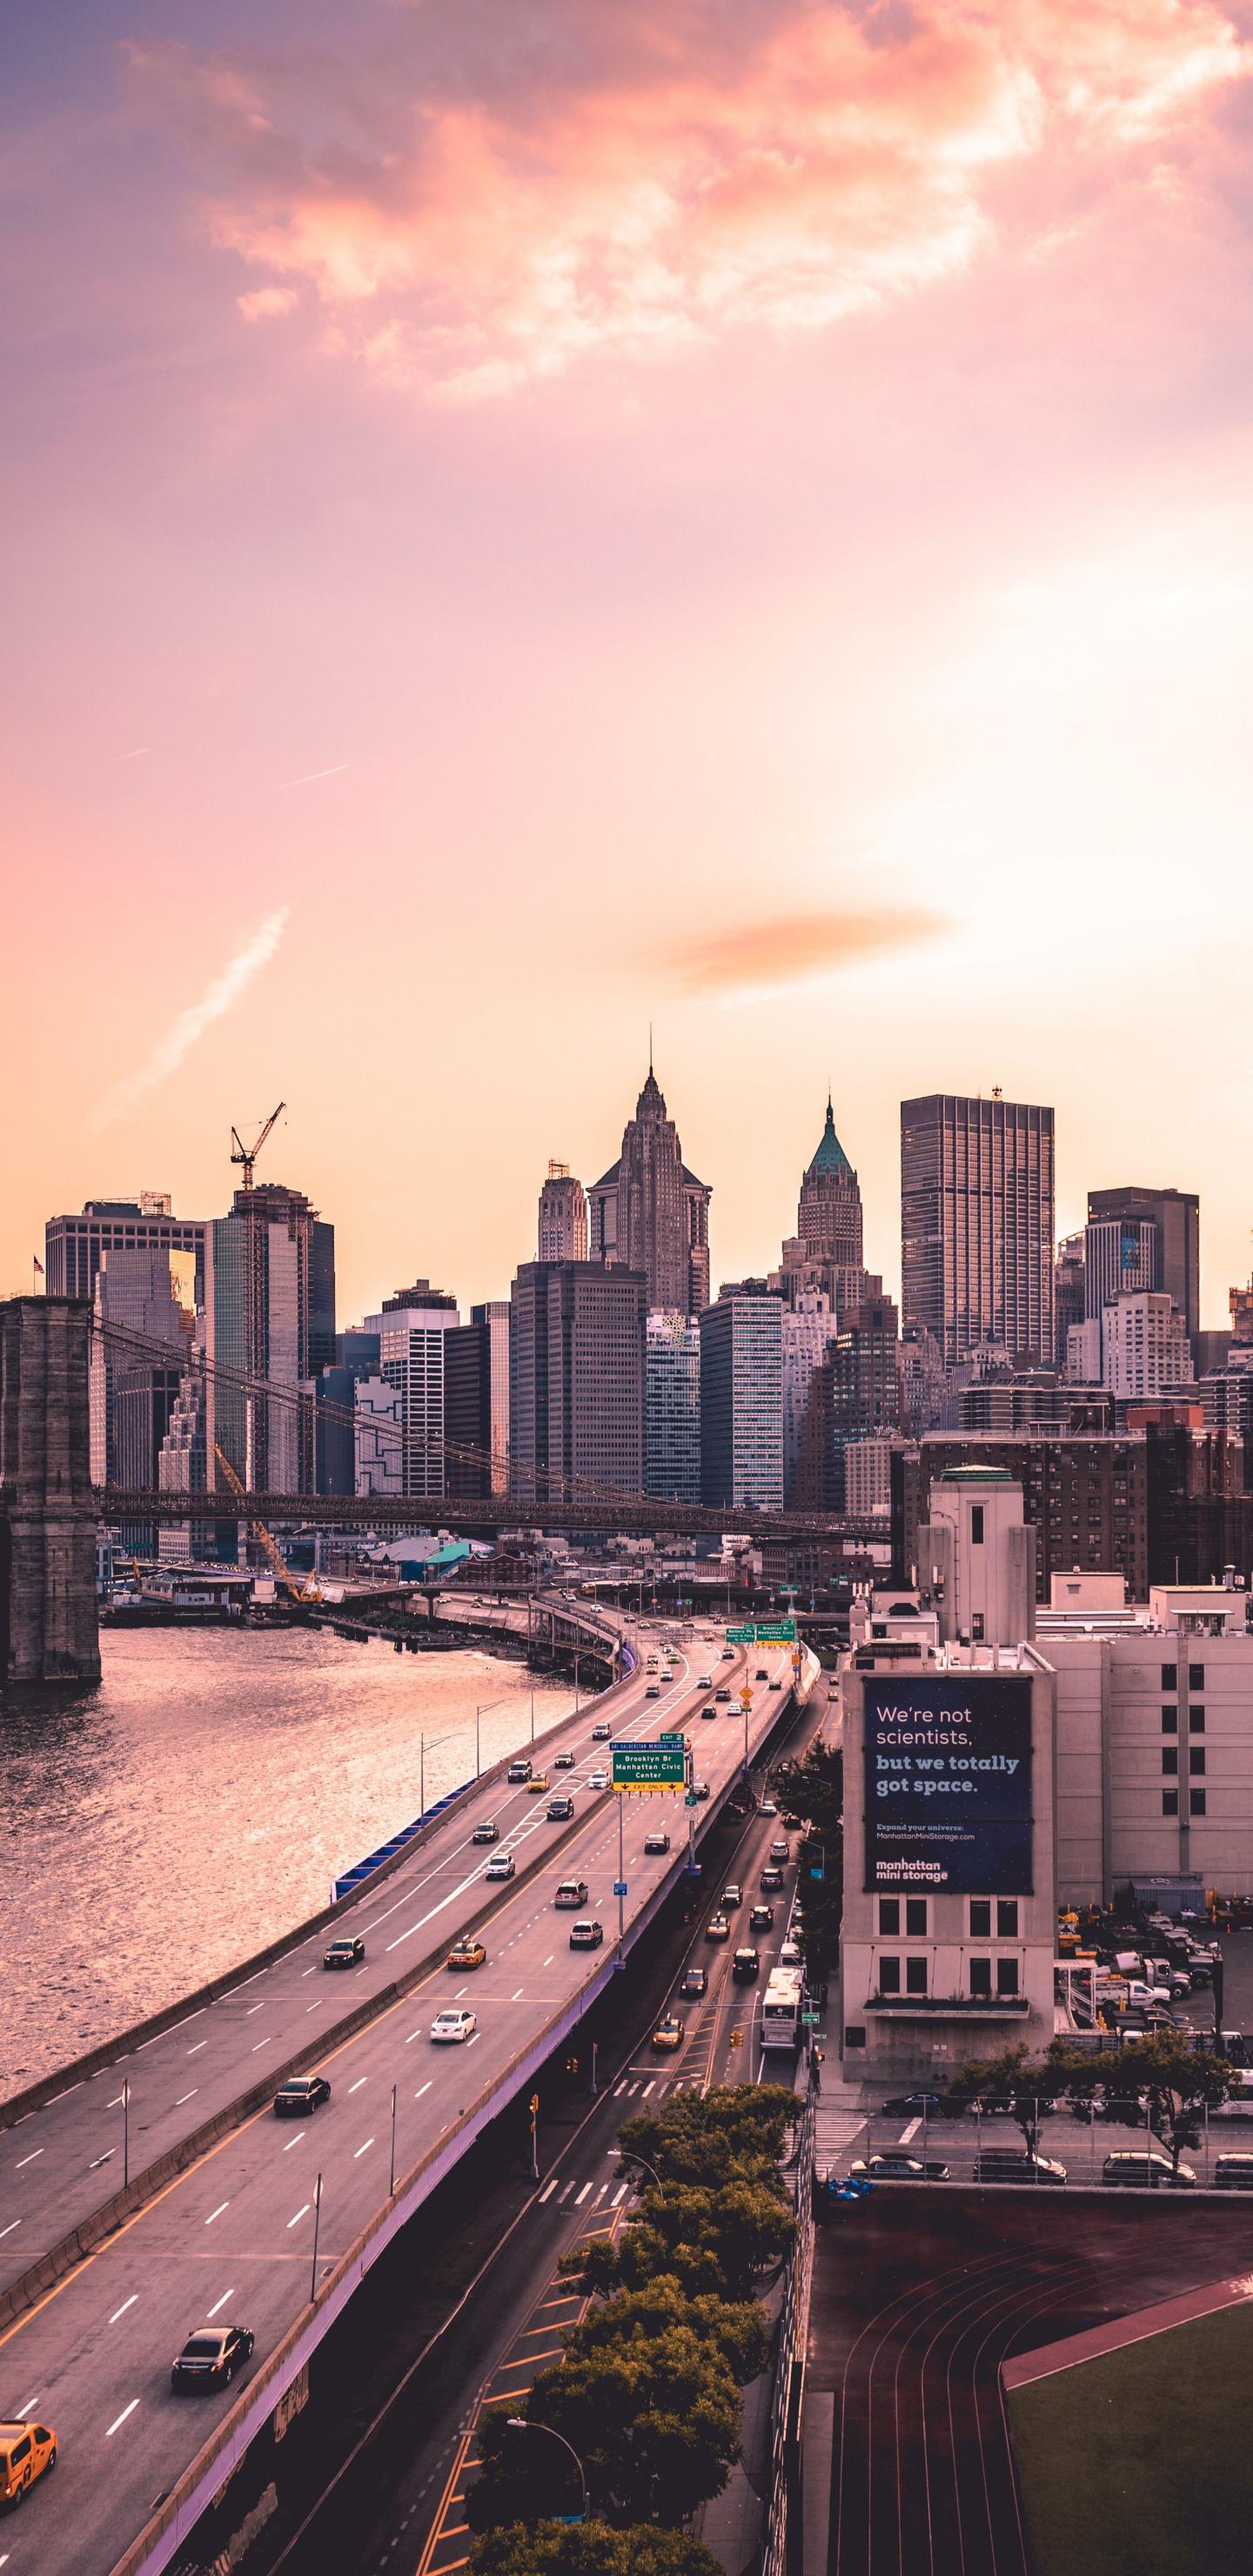 Download 1440x2960 Wallpaper Manhattan Bridge New York City Buildings Susnet Samsung Galaxy S8 Samsung Galaxy S8 Plus 1440x2960 Hd Image Background 10333